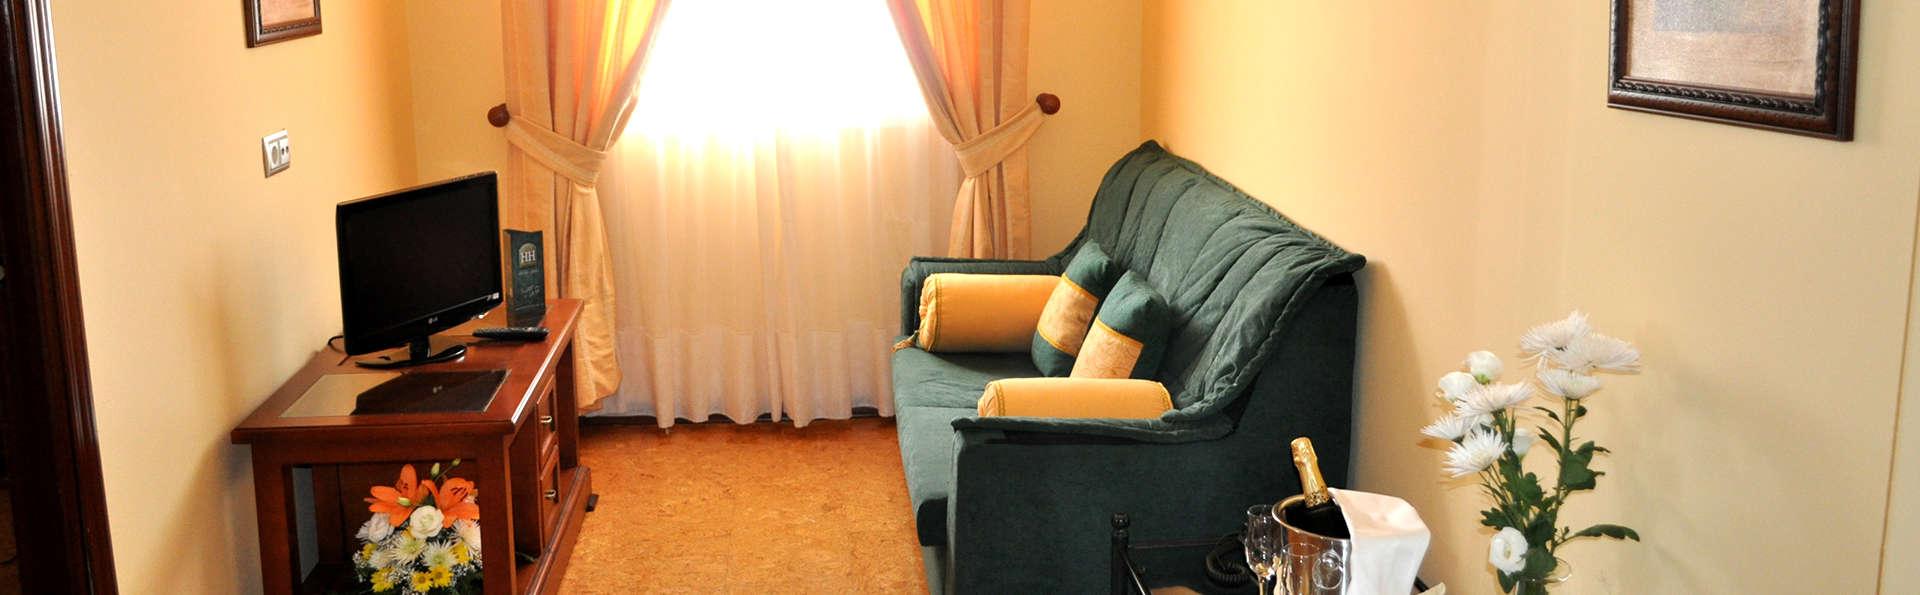 Hotel Heredero - Edit_Lounge.jpg